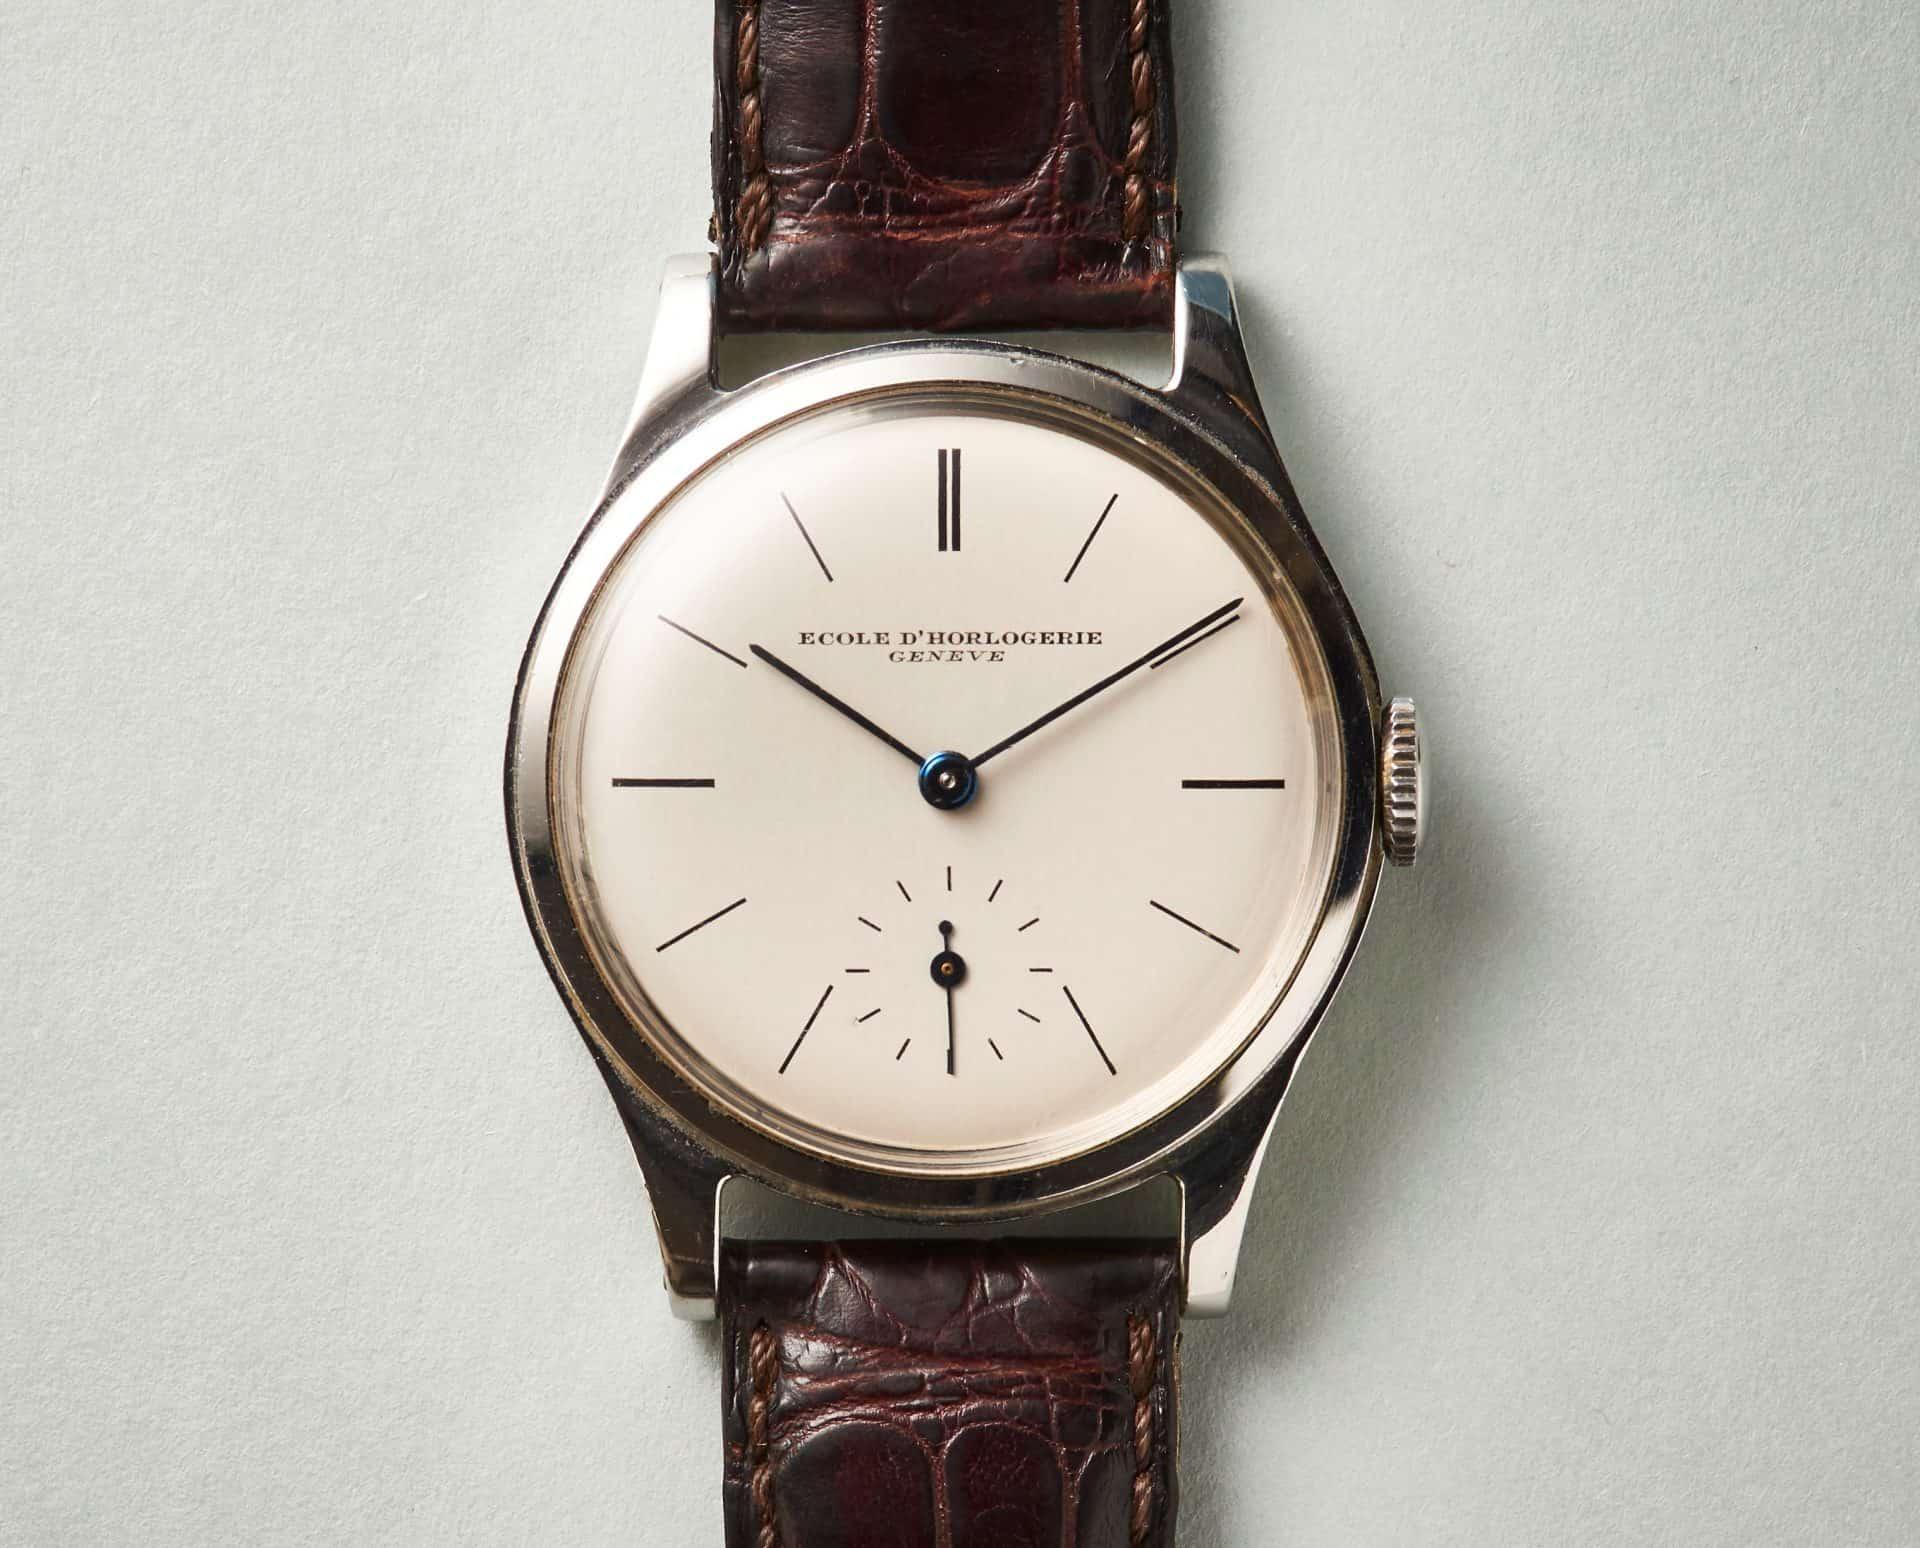 Schuluhr Ecole d'horlogerie de GenèveSchuluhr – aber mit Patek Philippe Rohwerk